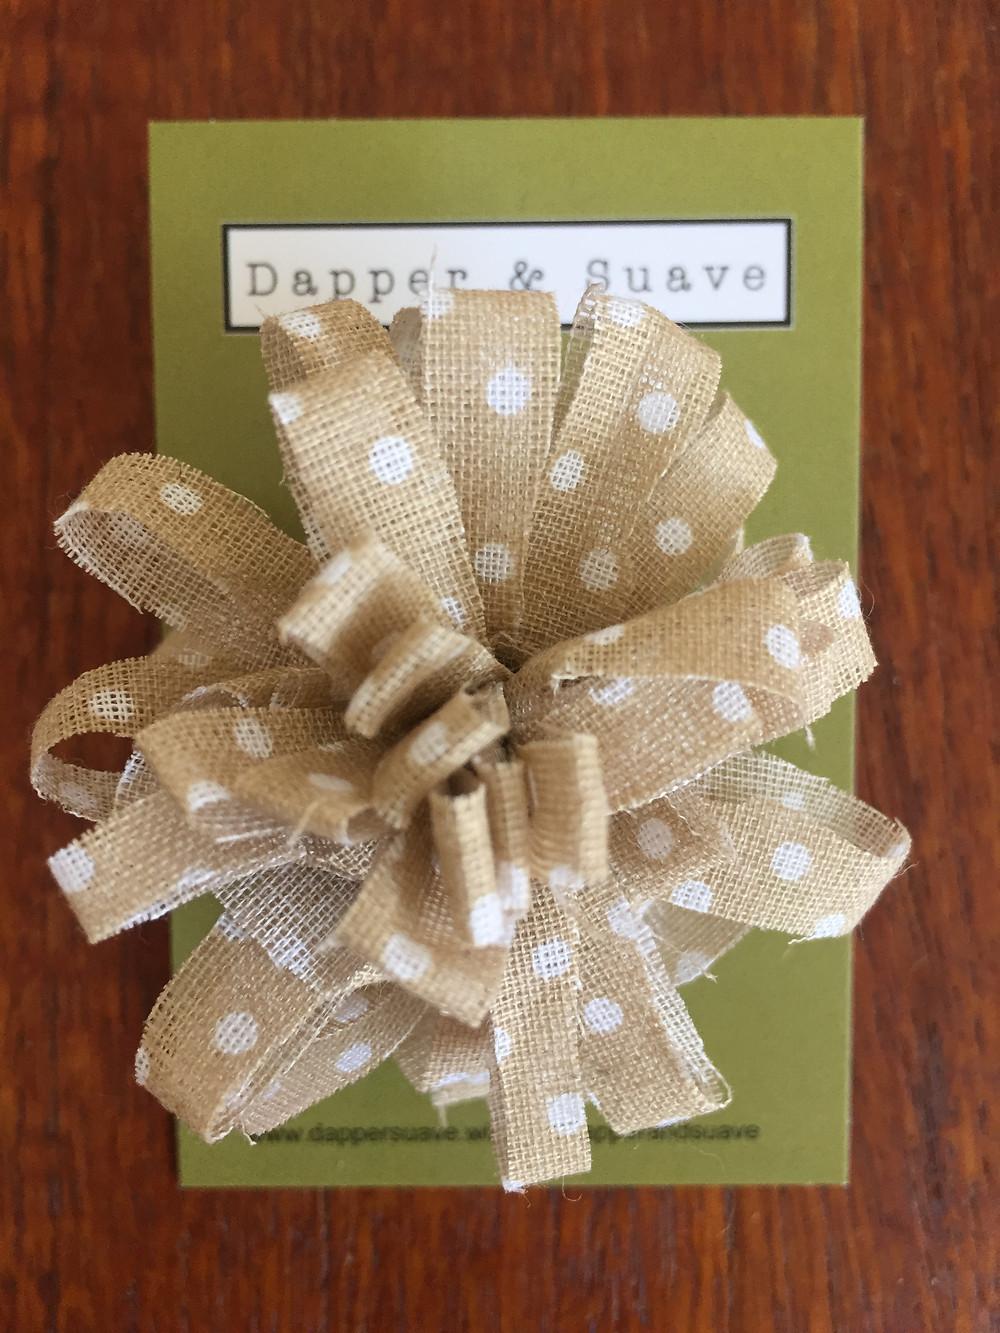 Dapper & Suave Cappucino Spot Lapel Pin